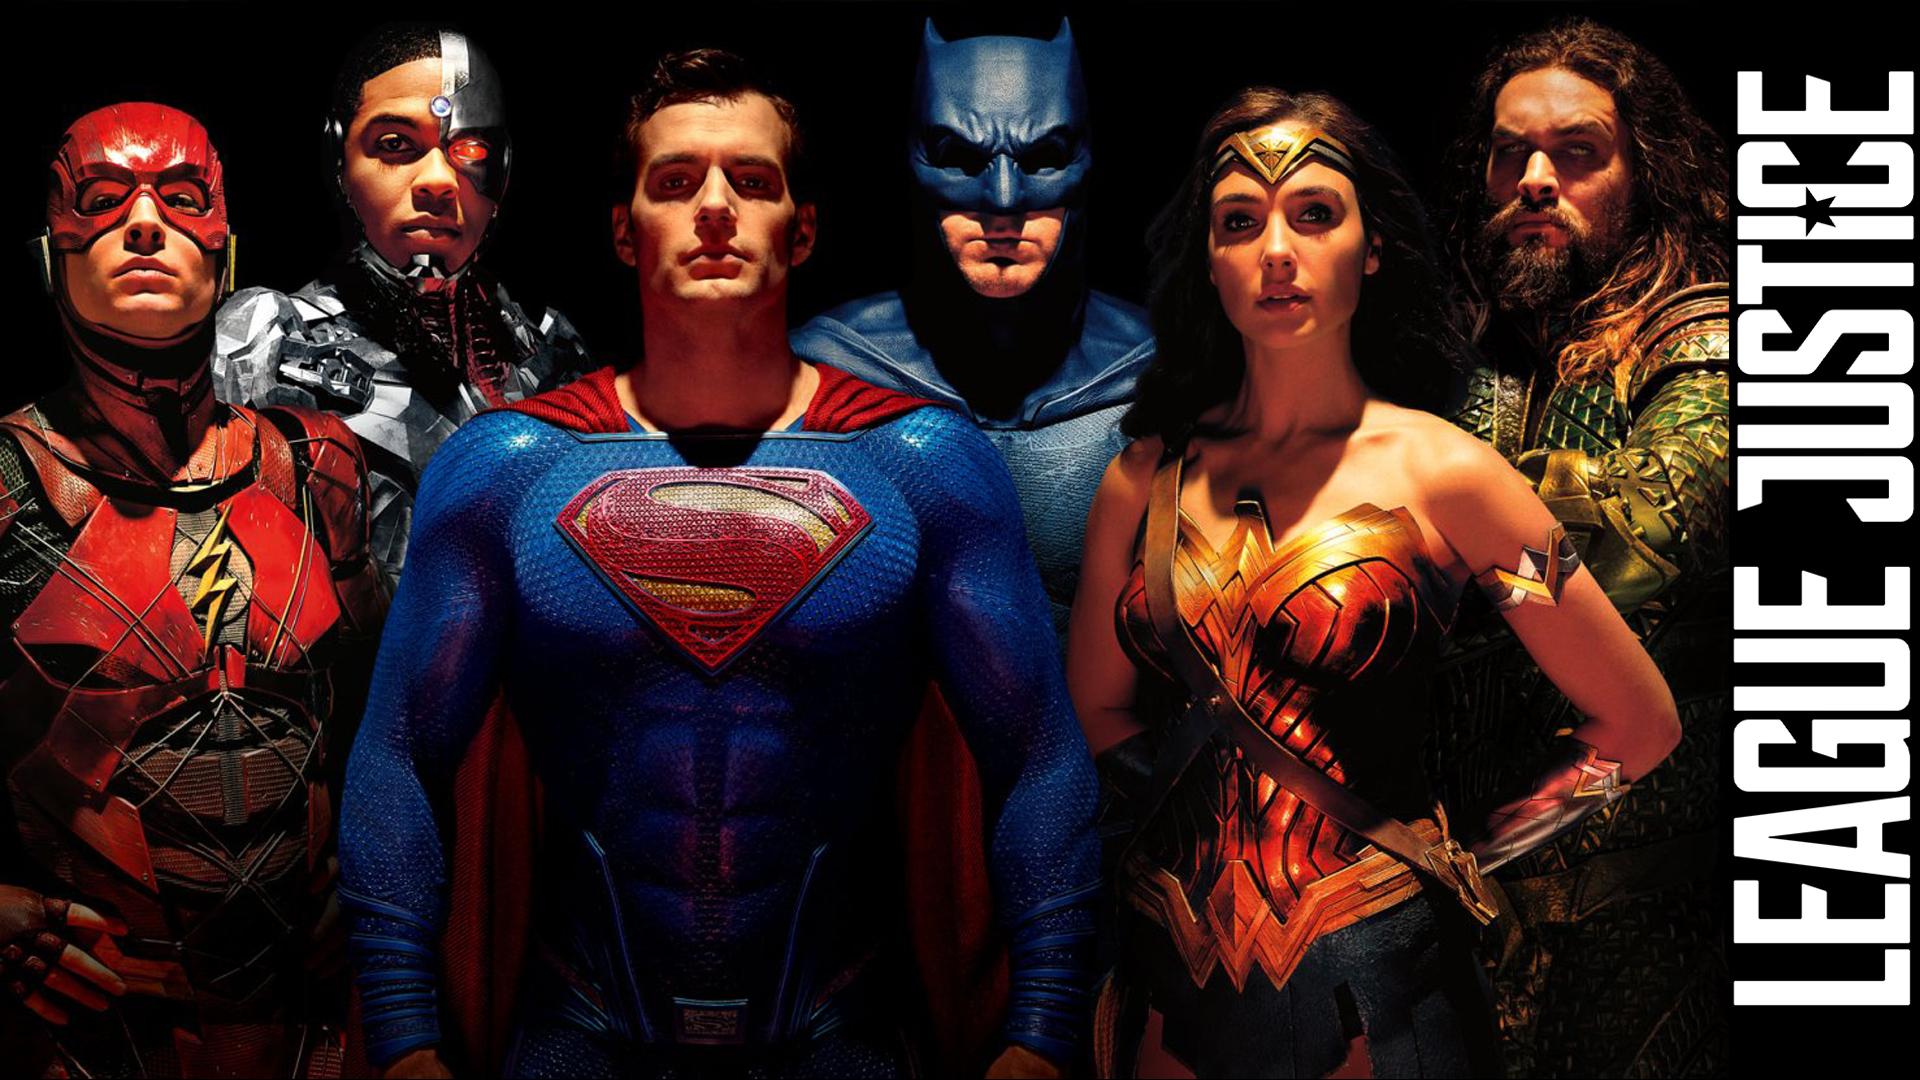 Wallpaper Justice League 2017 Movies Flash Superman: デスクトップ壁紙 : ジャスティスリーグ2017, バットマンvスーパーマンドーン・オブ・ジャスティス, マン・オブ